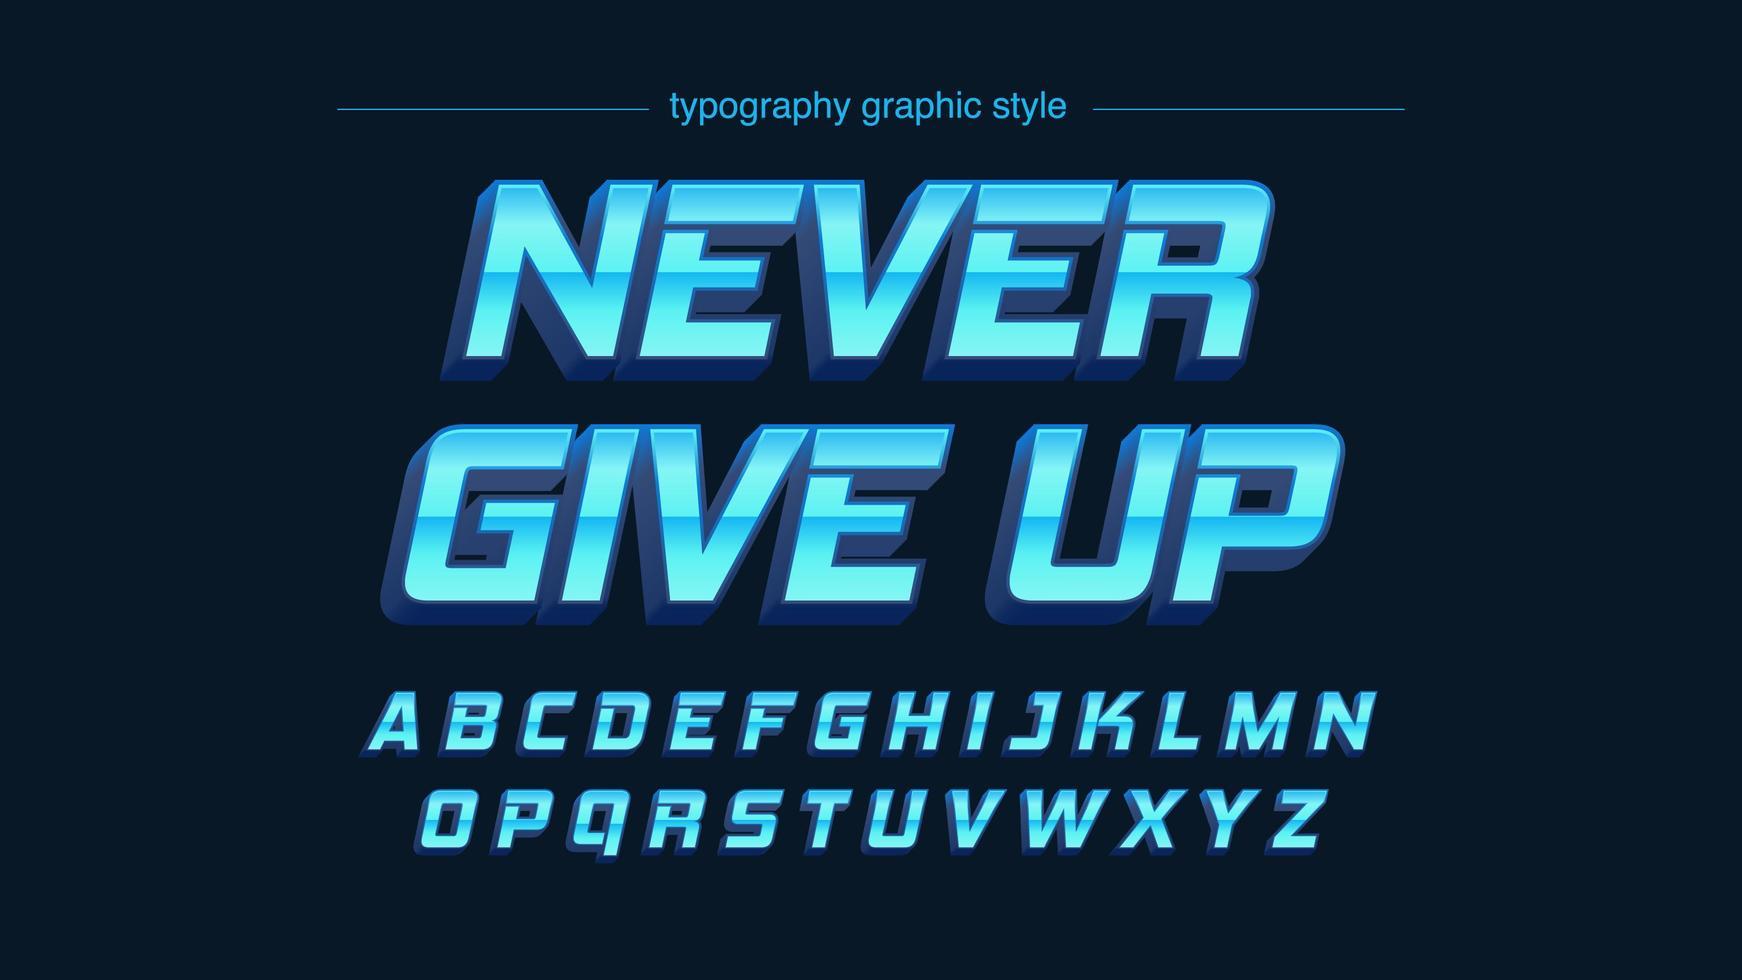 vibrante azul cromo 3d metálico artístico alfabeto vector